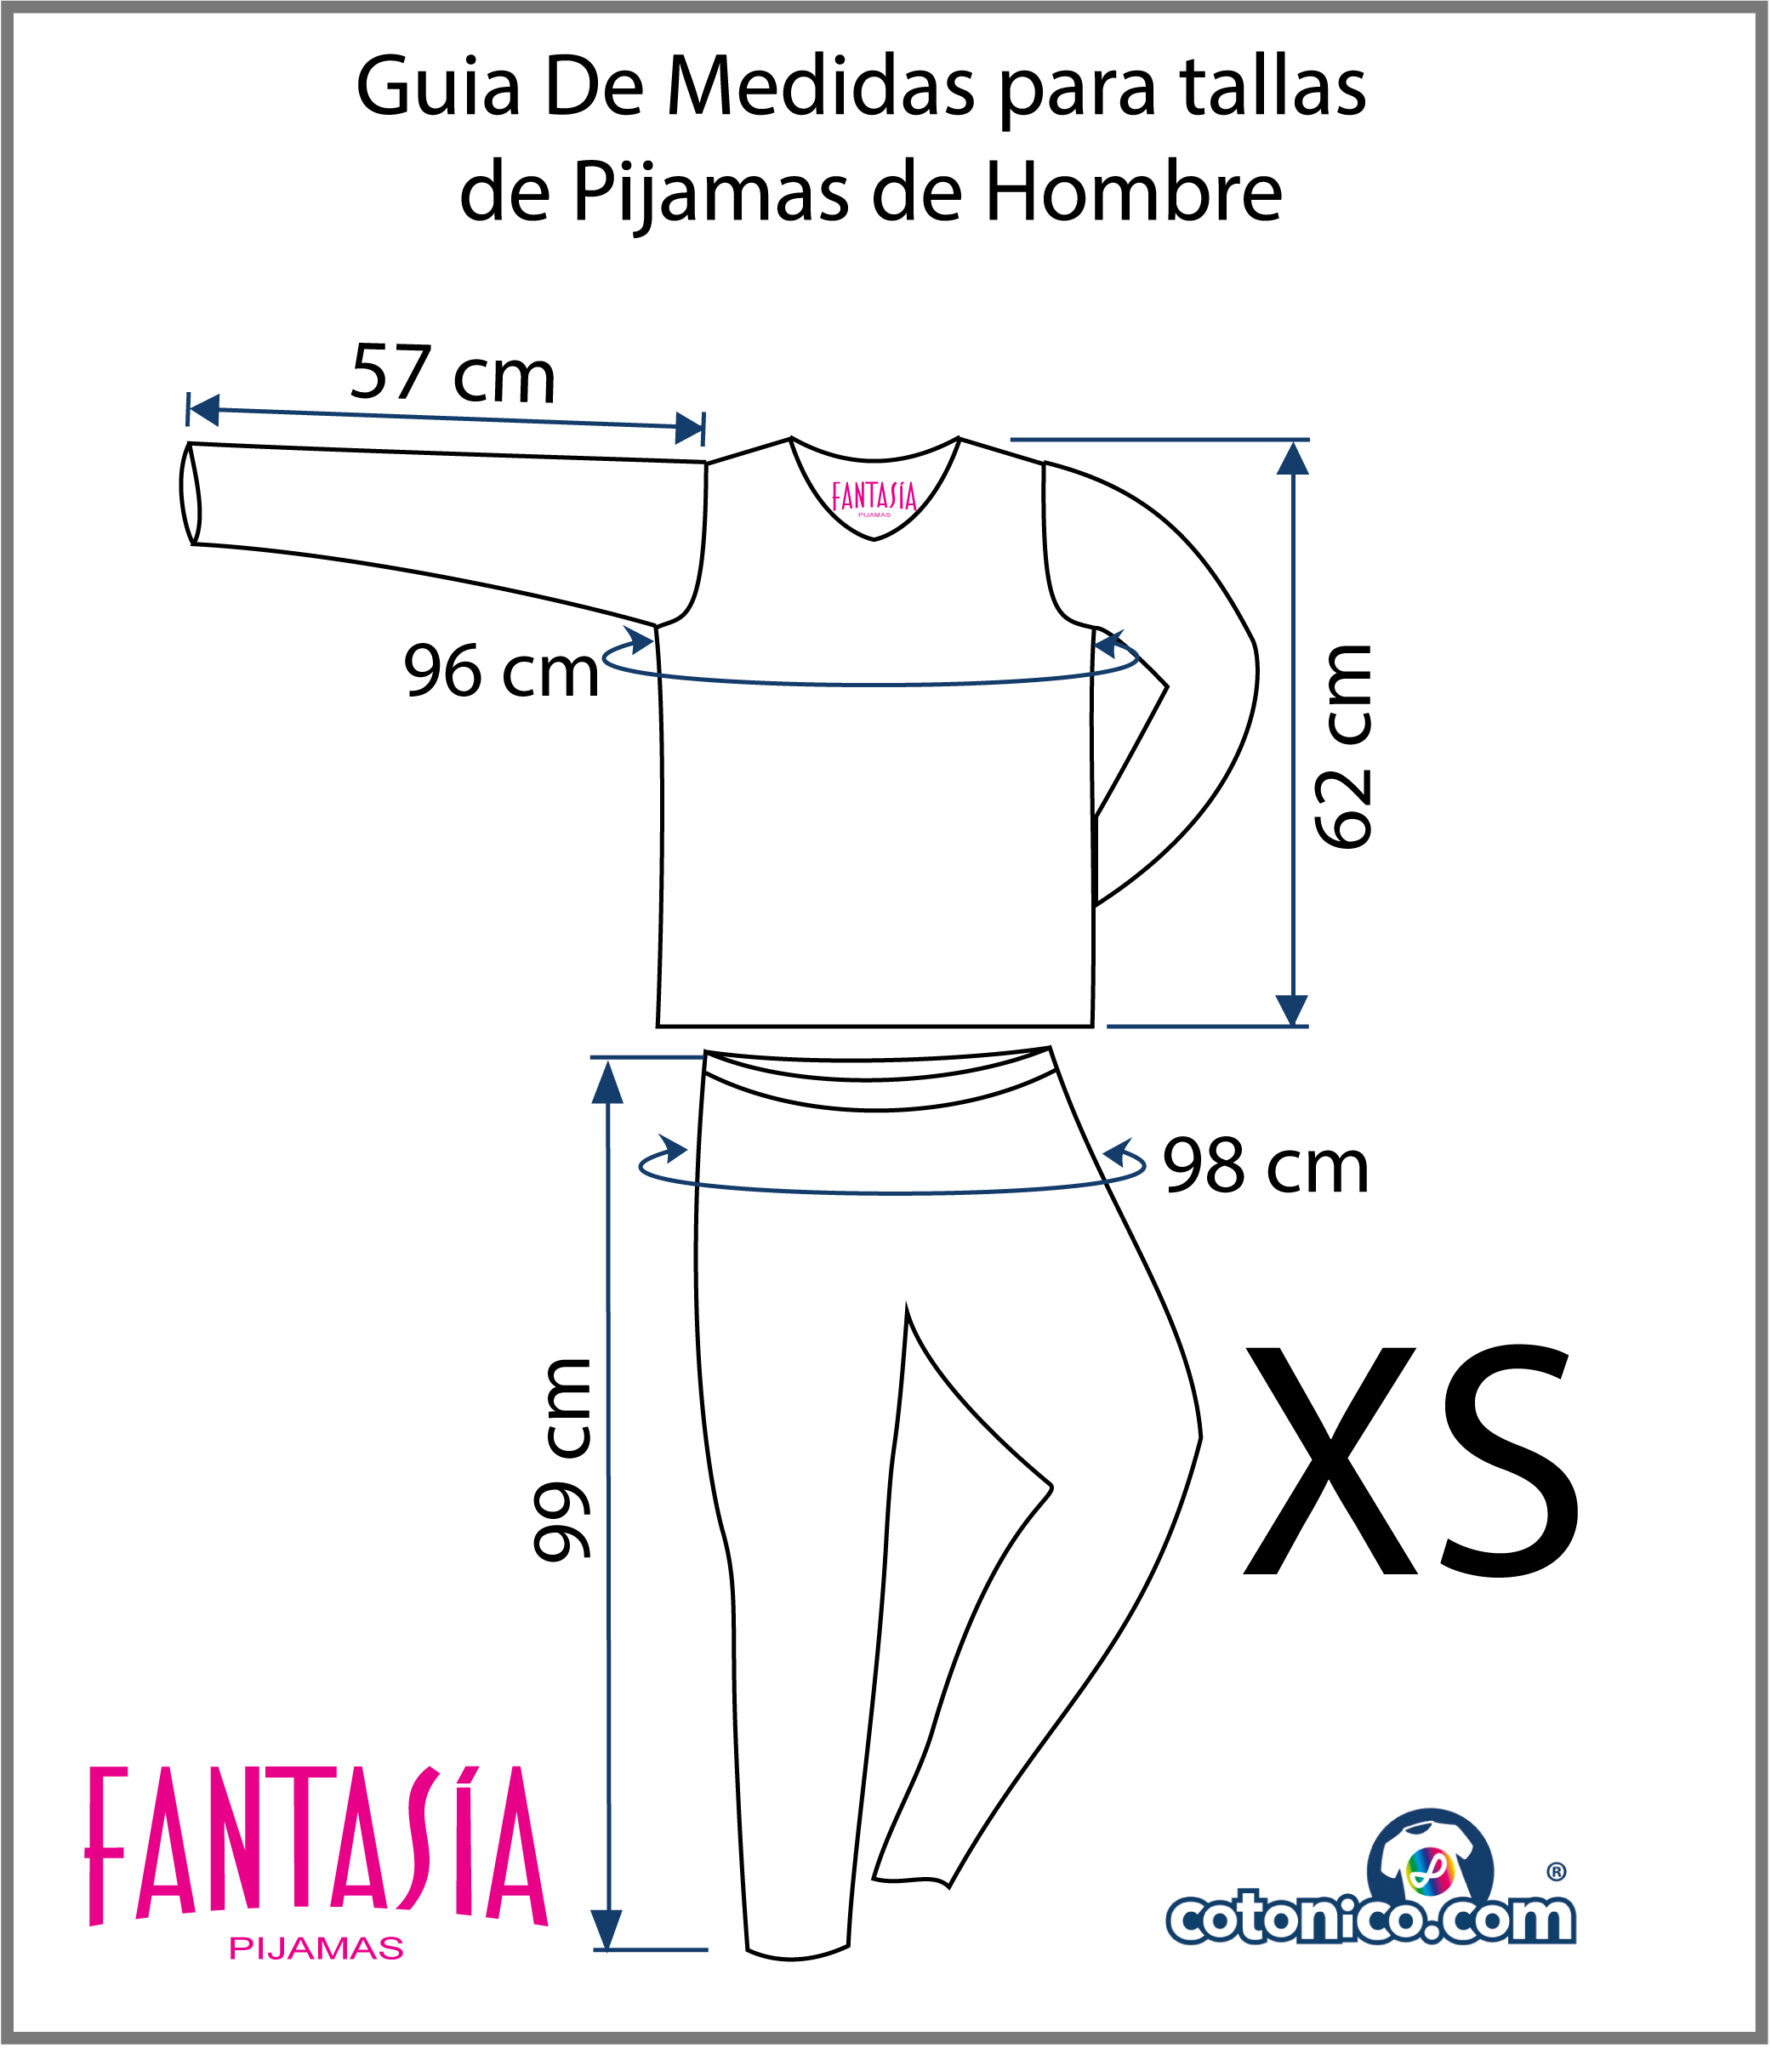 Guia-De-Tallas-Pijamas-De-Hombre-XS